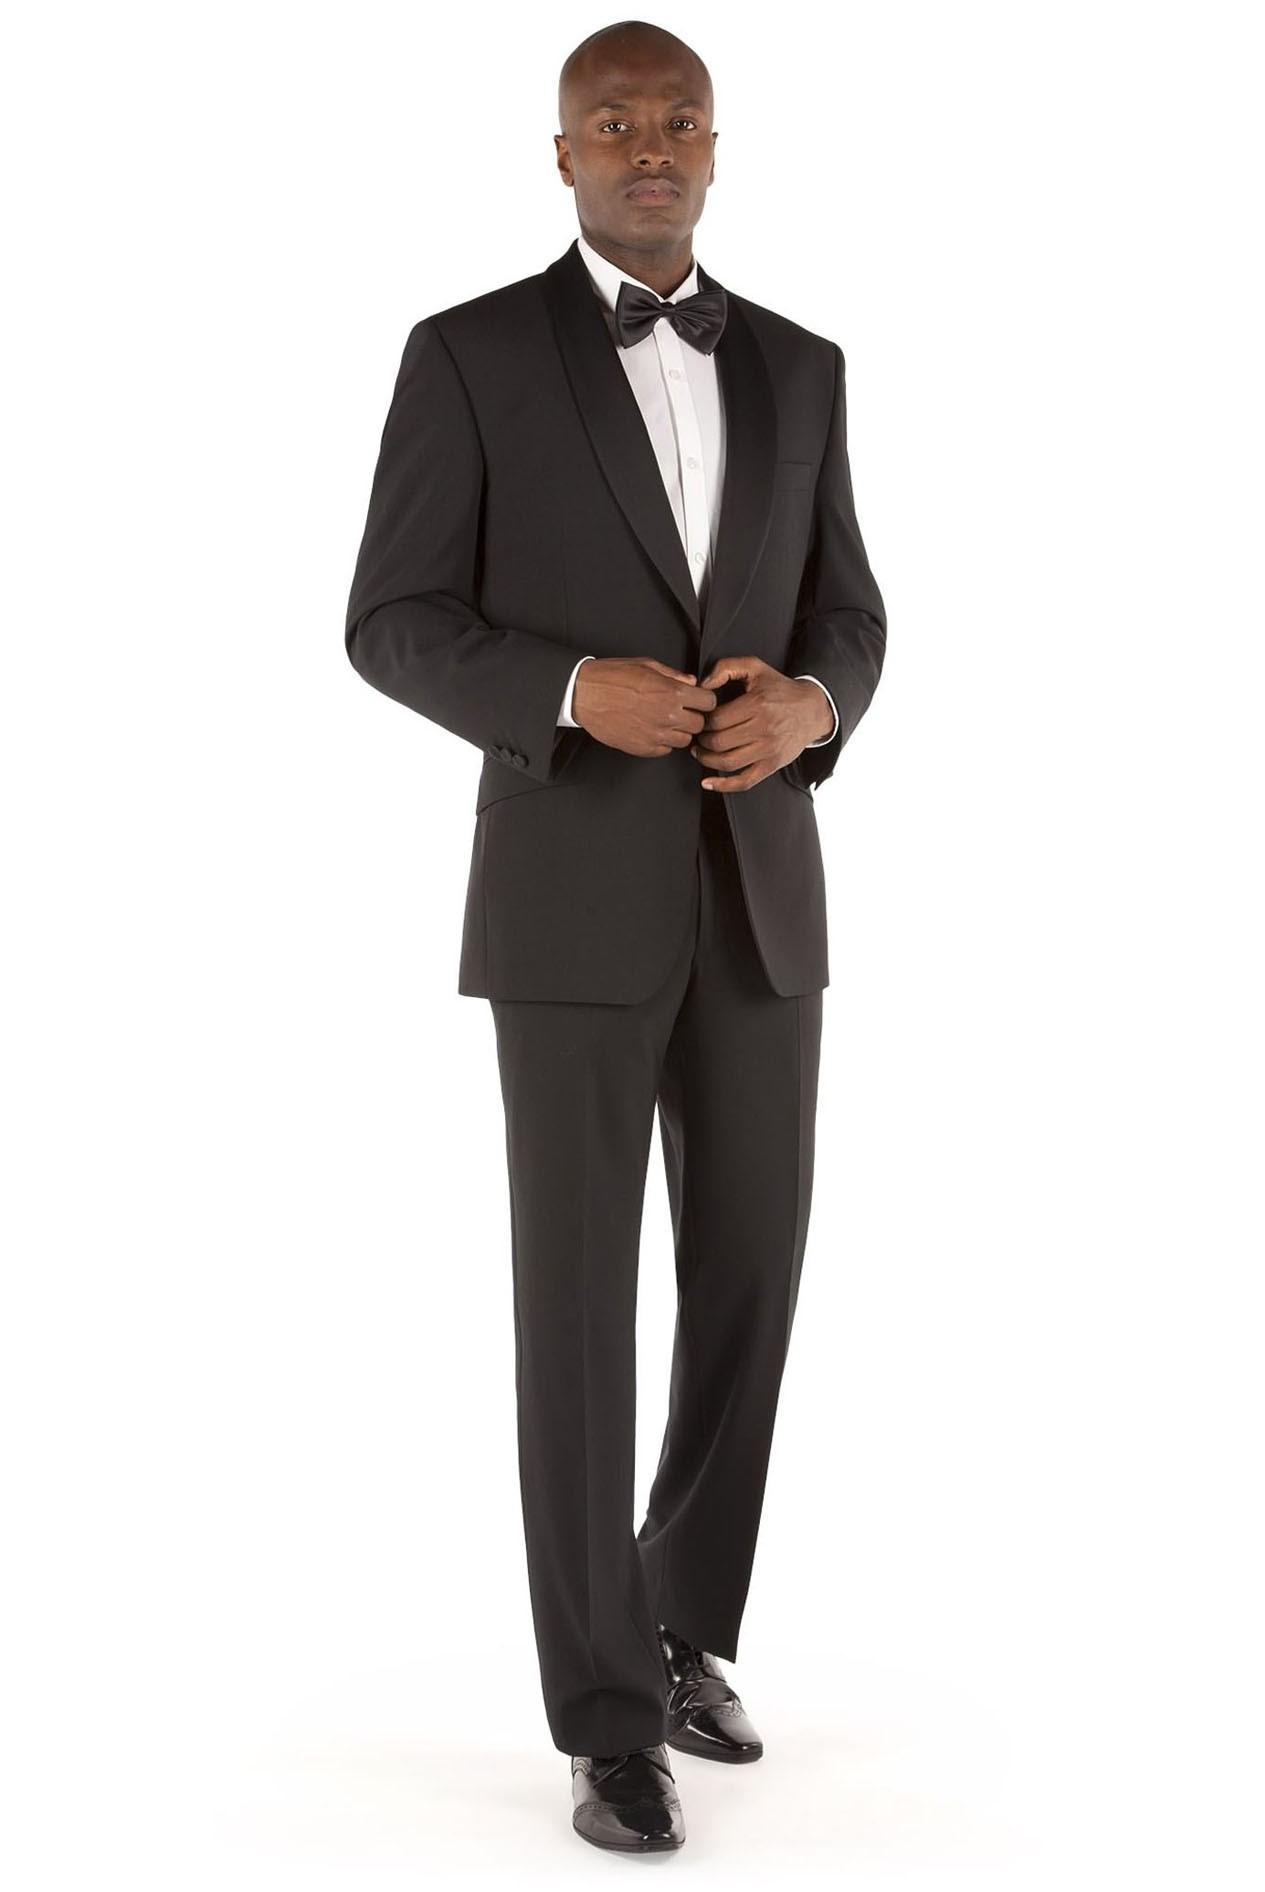 Men Tuxedo Dinner Suit Navy Black Shawl Collar Black Satin Tailored Fit Vintage